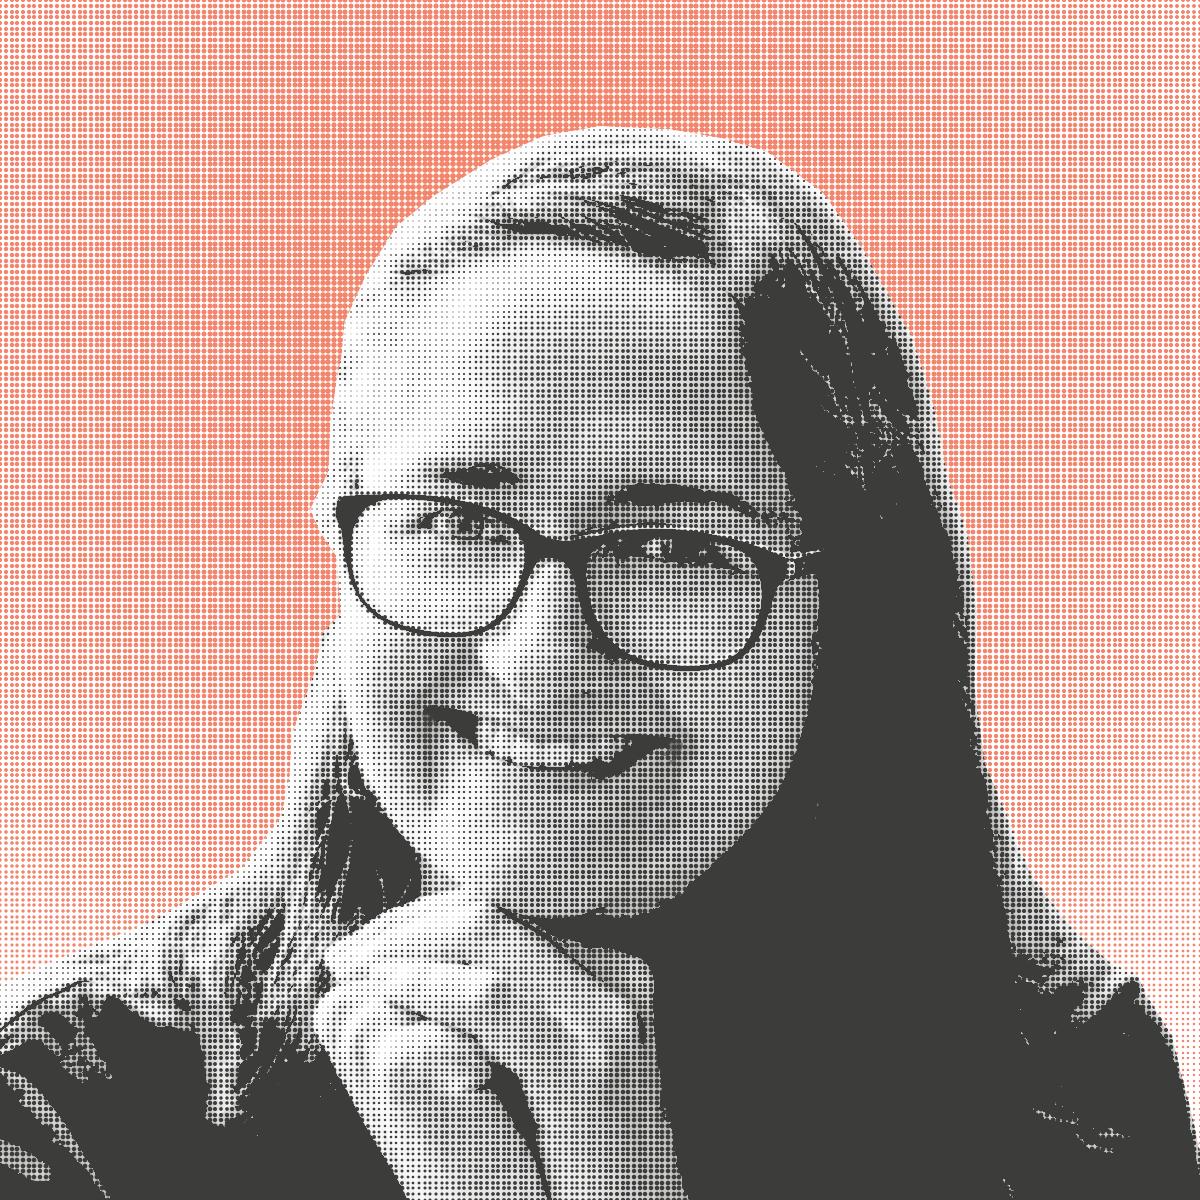 Natalia Staszczak-Prüfer